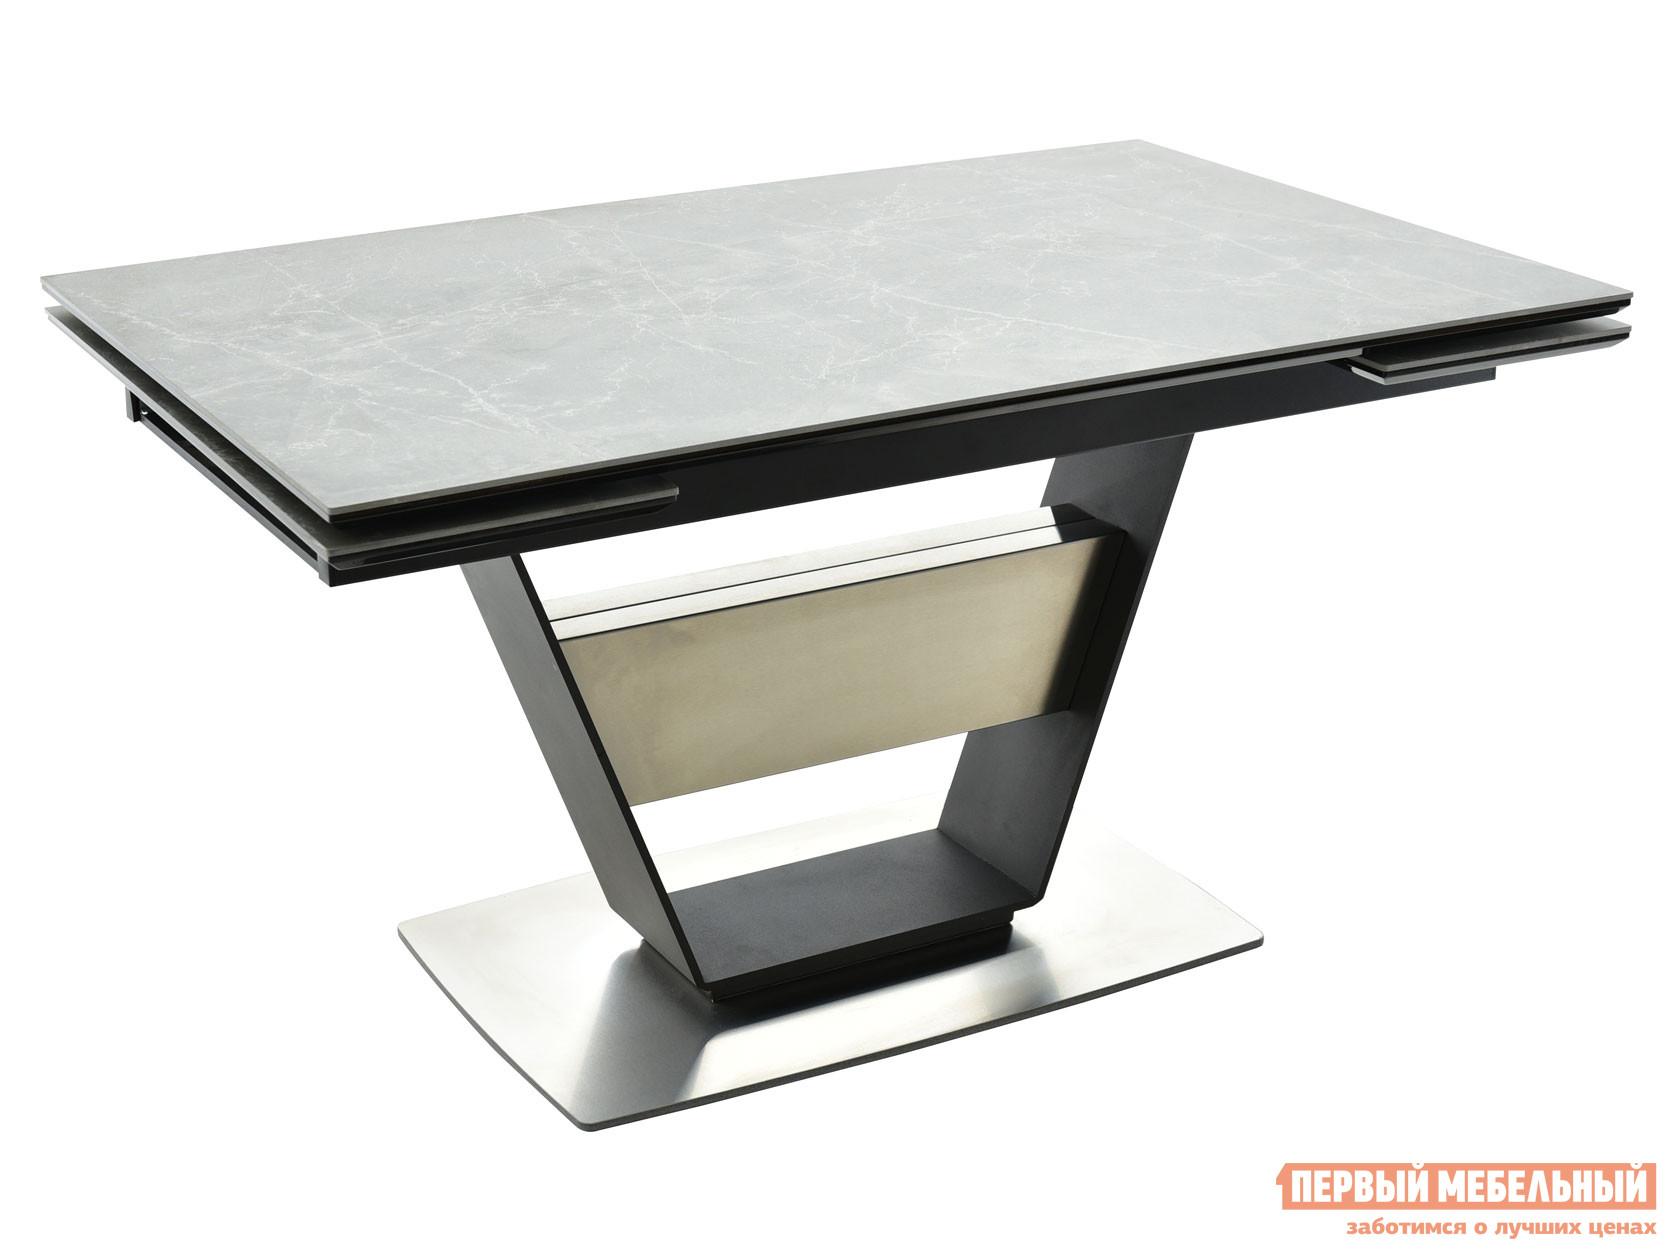 Кухонный стол  Мальта Bayona grey / Черный, металл Мебвилл 127370